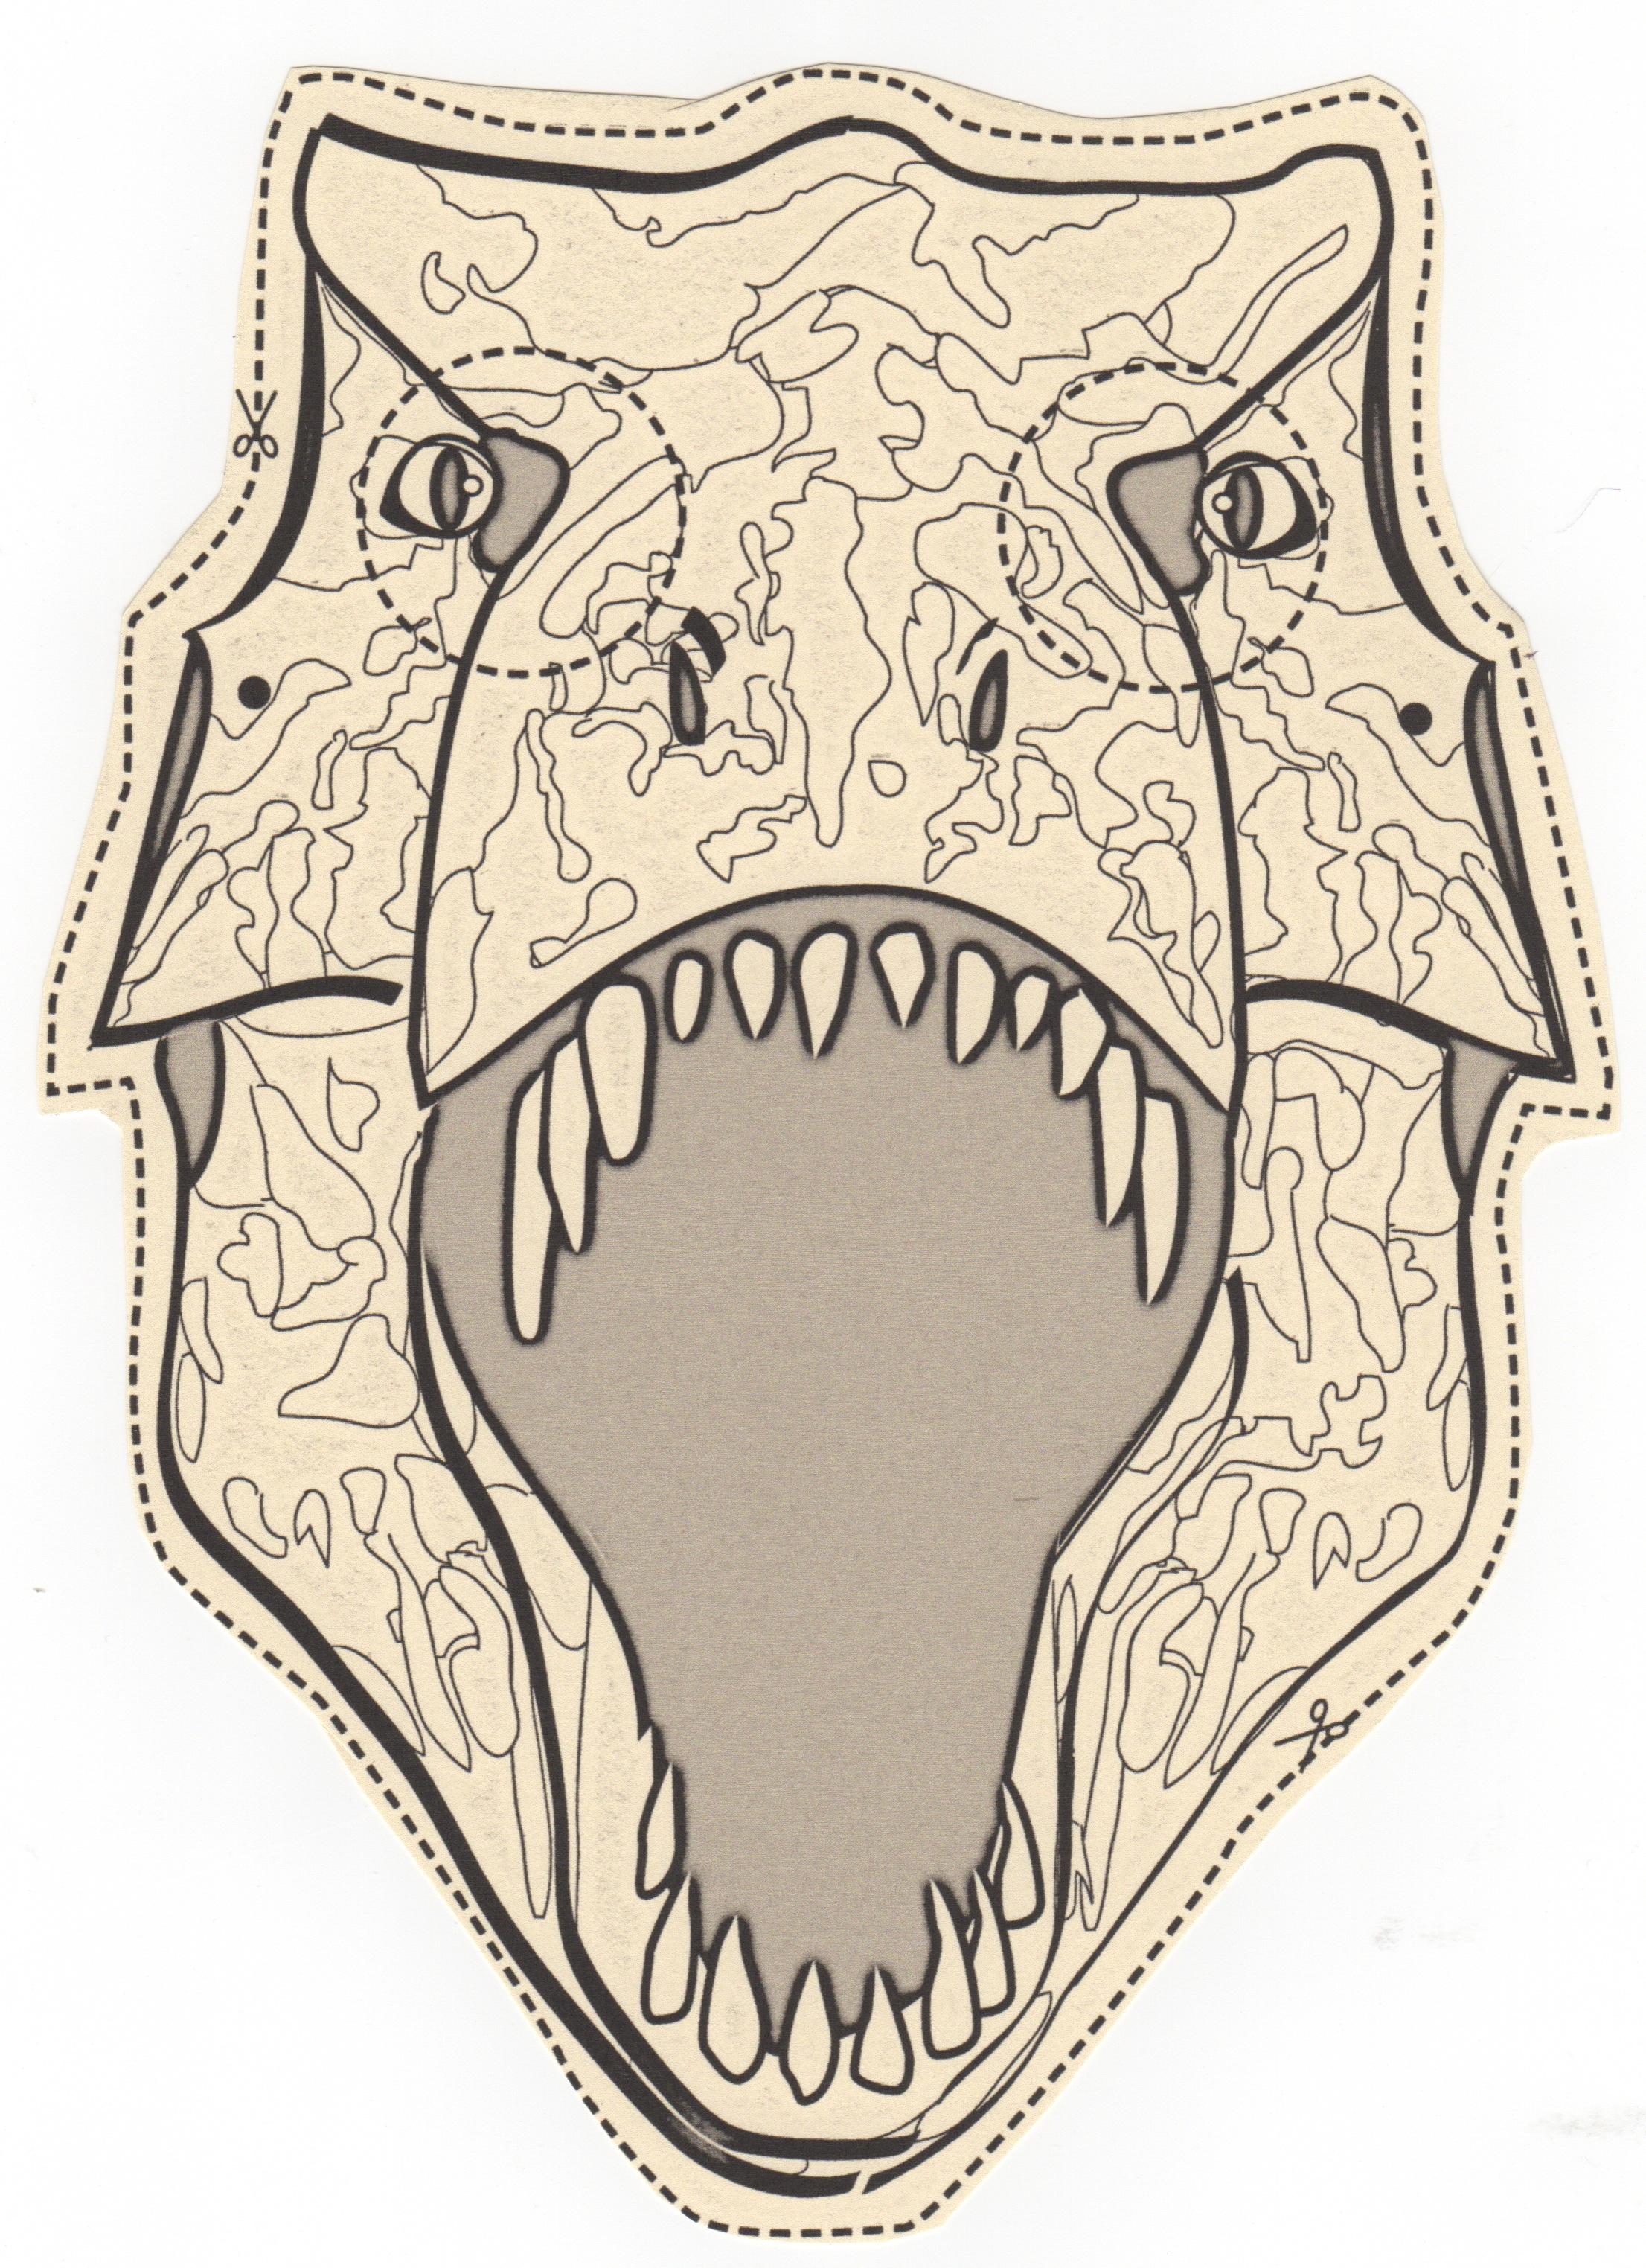 Dinosaur Mask Template The 10 Best My Dinosaur Mask